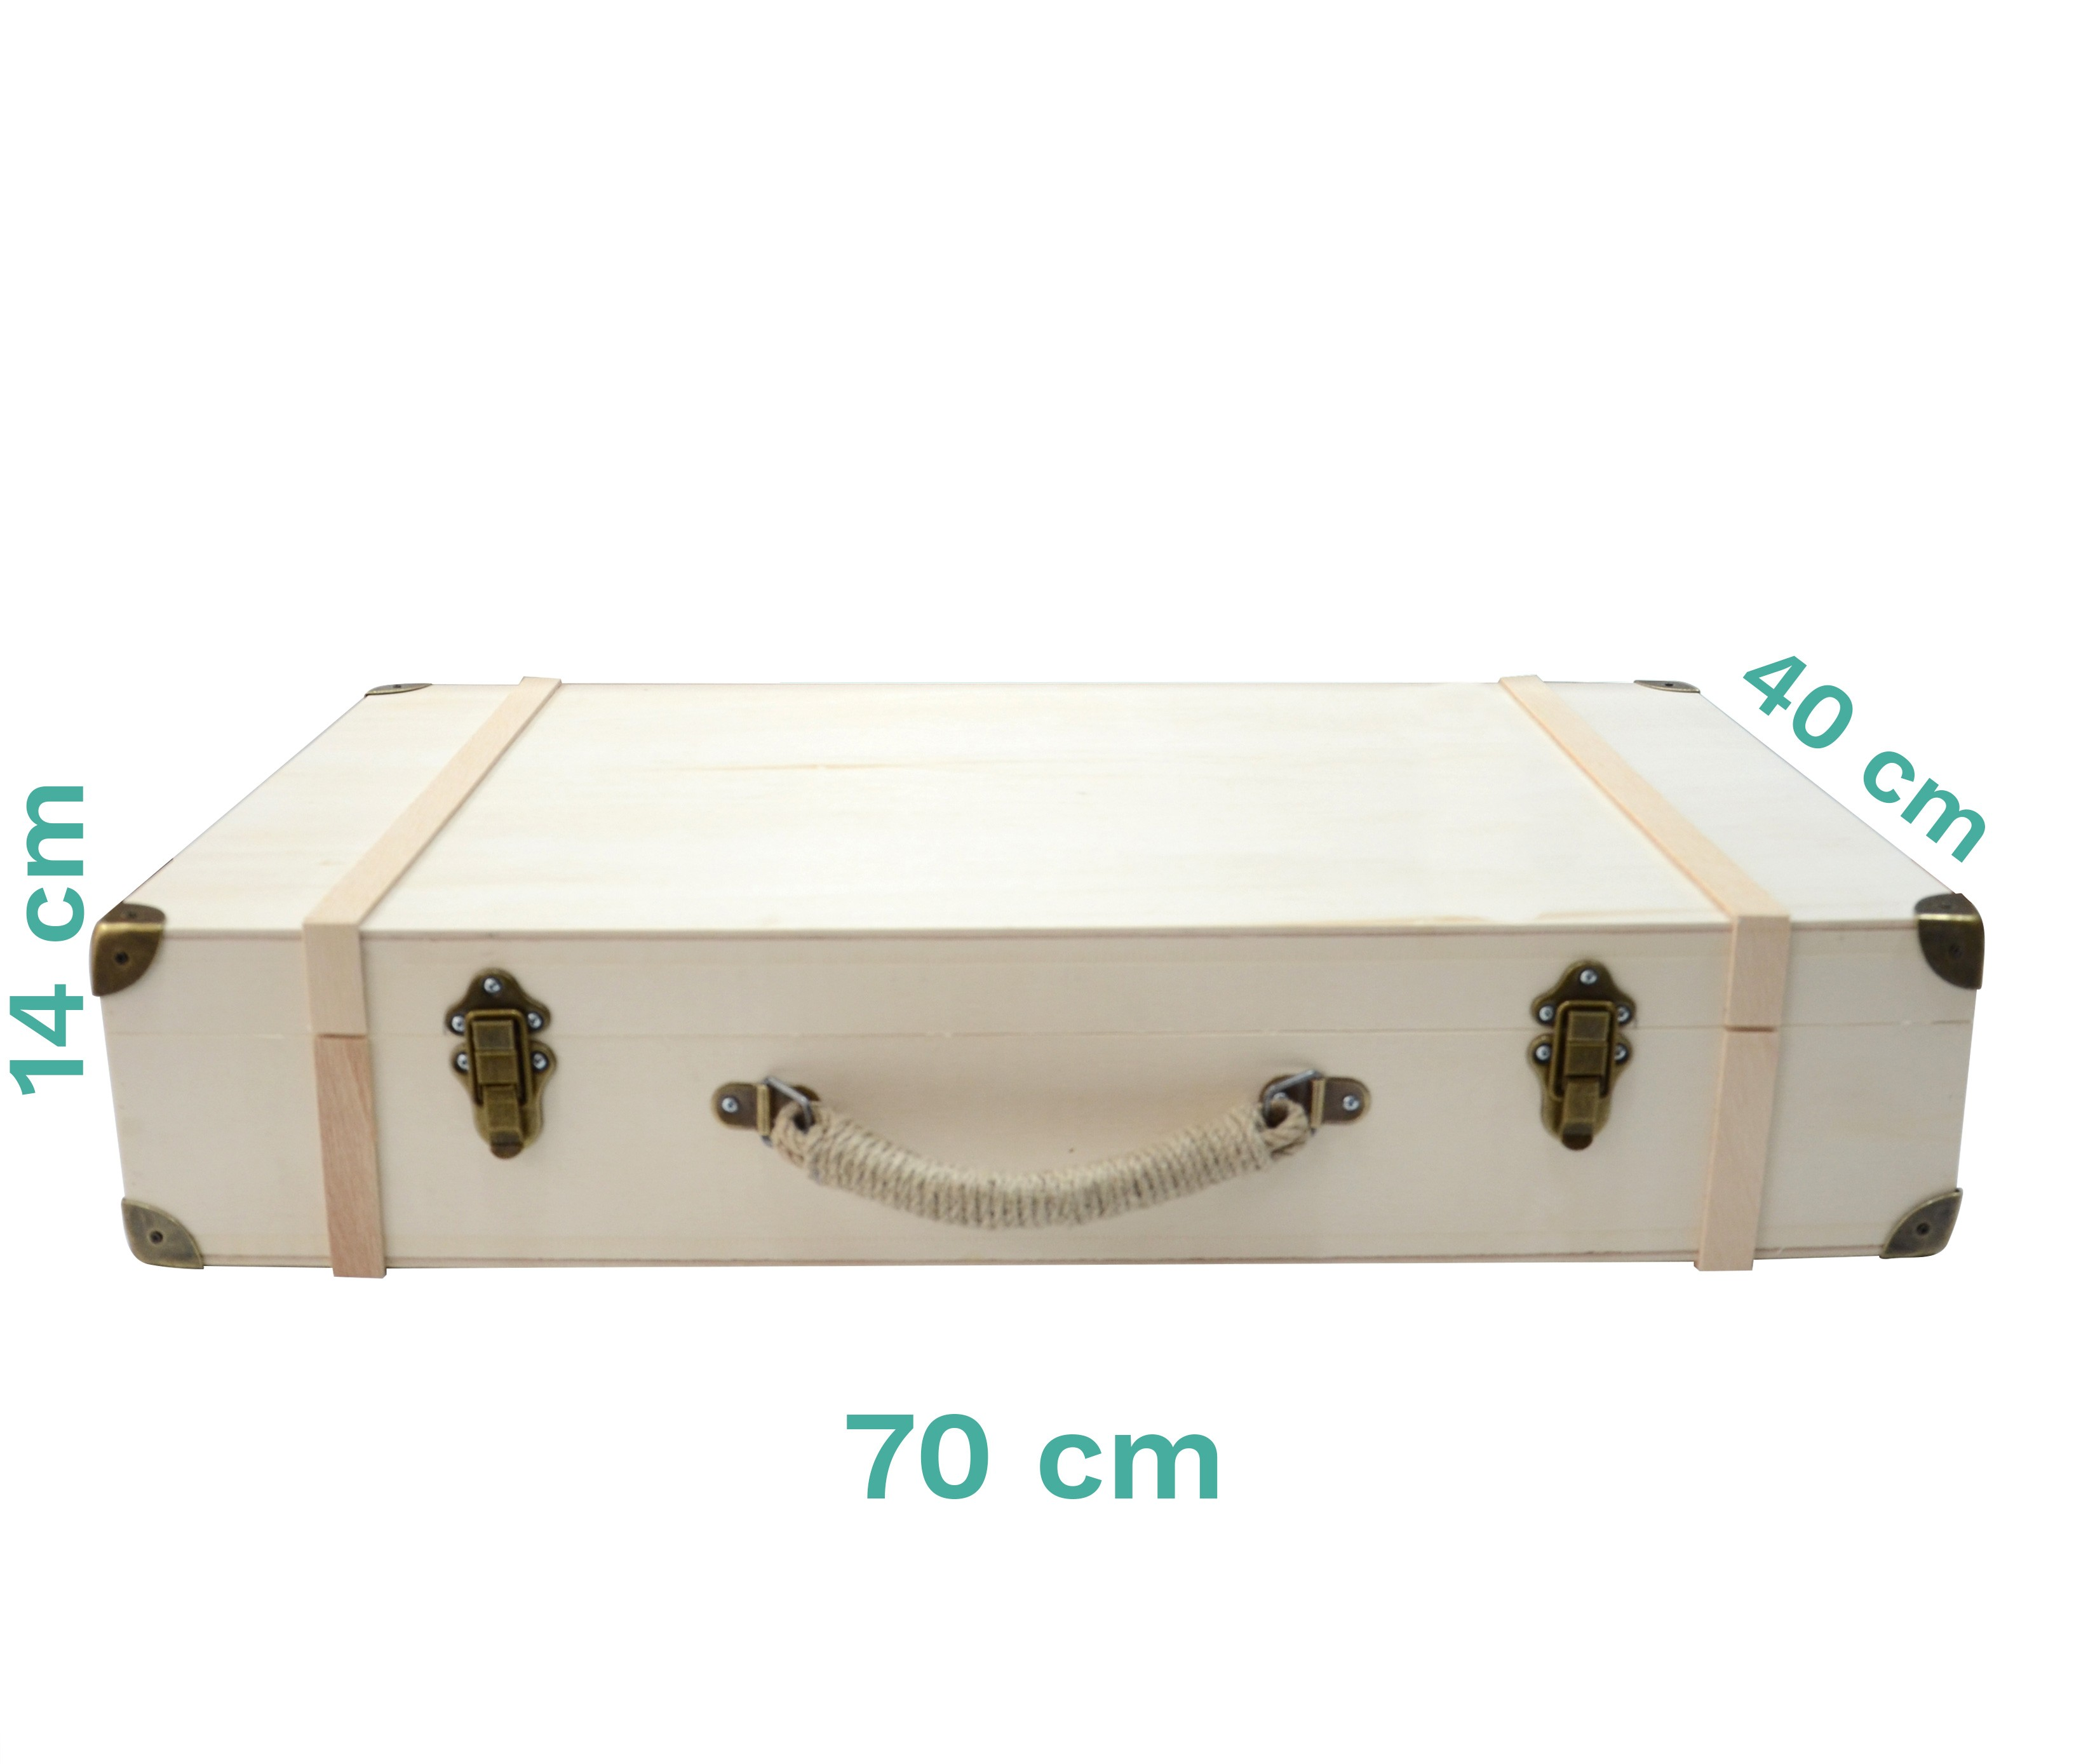 Bizart Bavul Masif Ahşap (Büyük Boy)